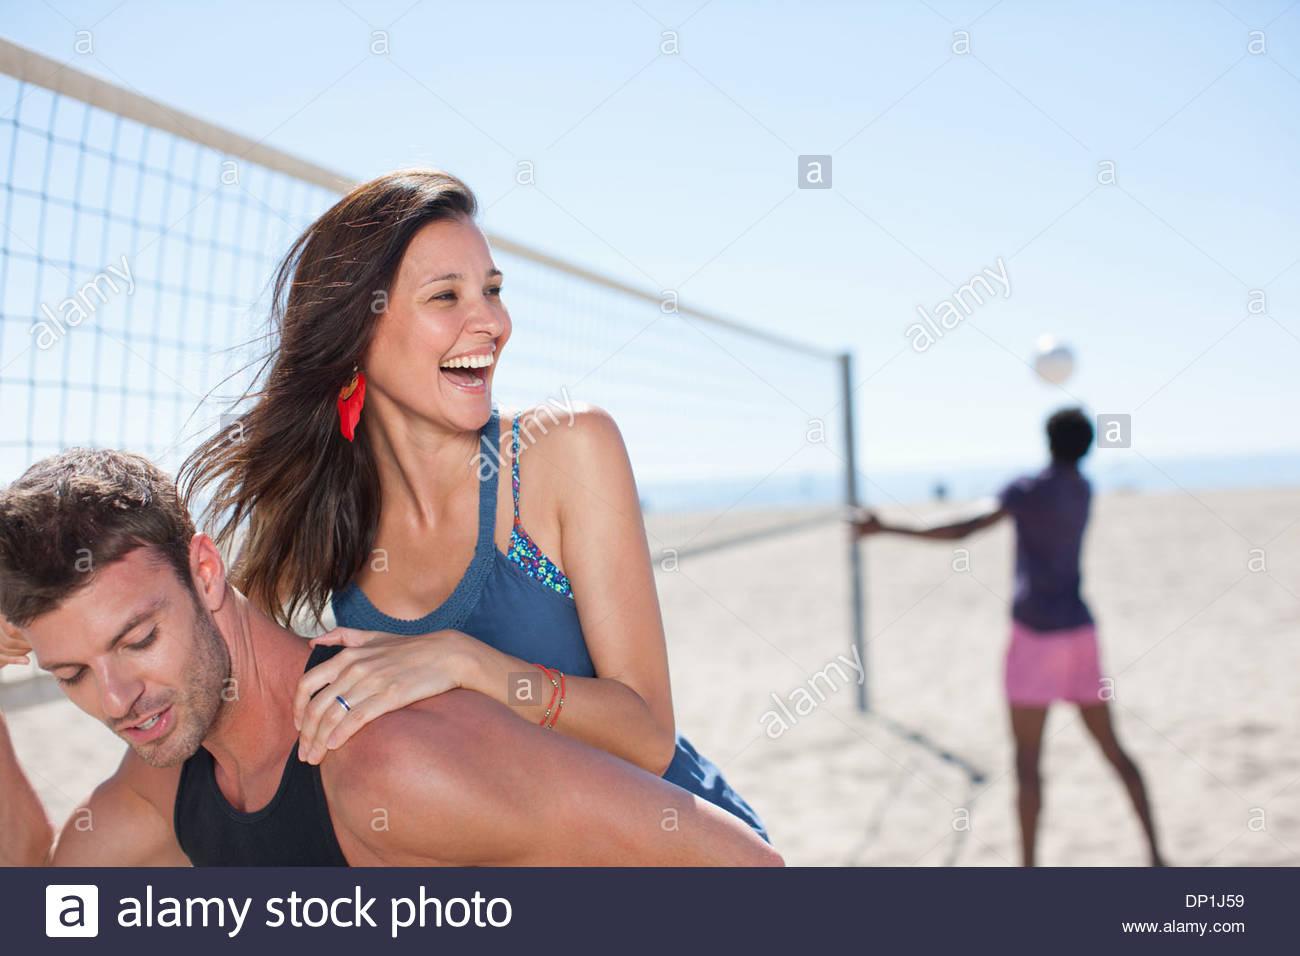 Man carrying girlfriend piggyback on beach Photo Stock